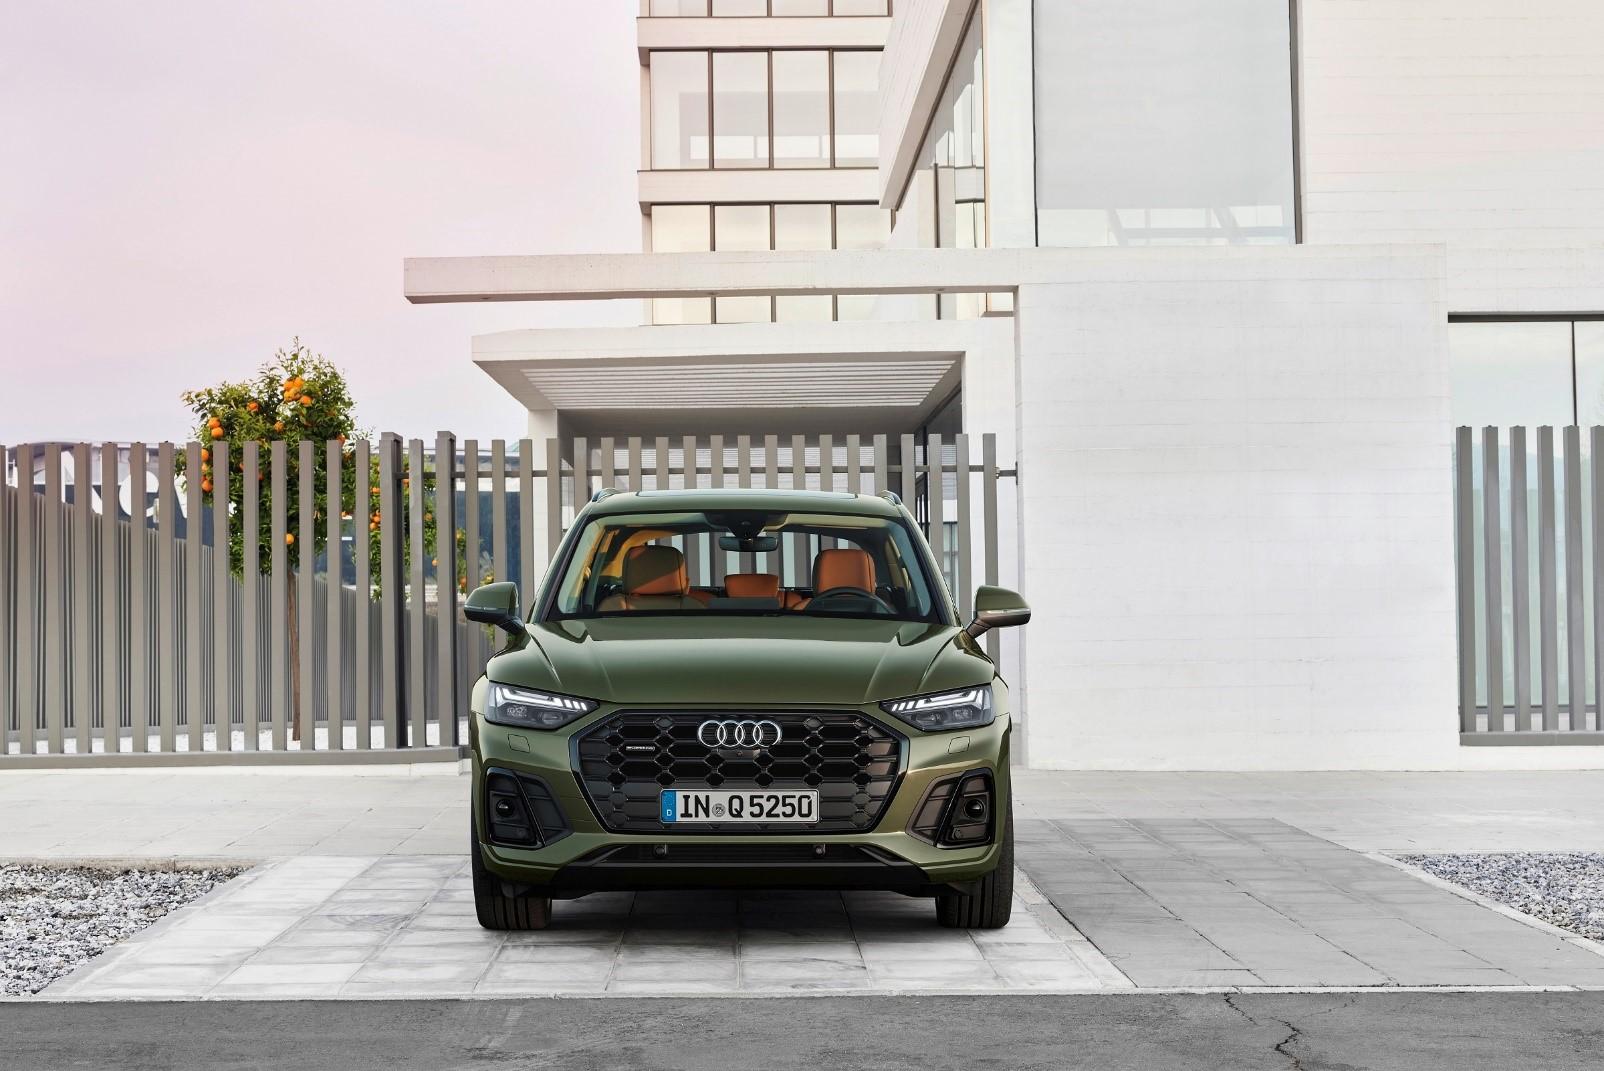 Audi Q5 - Σχεδιασμός - Εμπρός όψη σε district green χρώμα